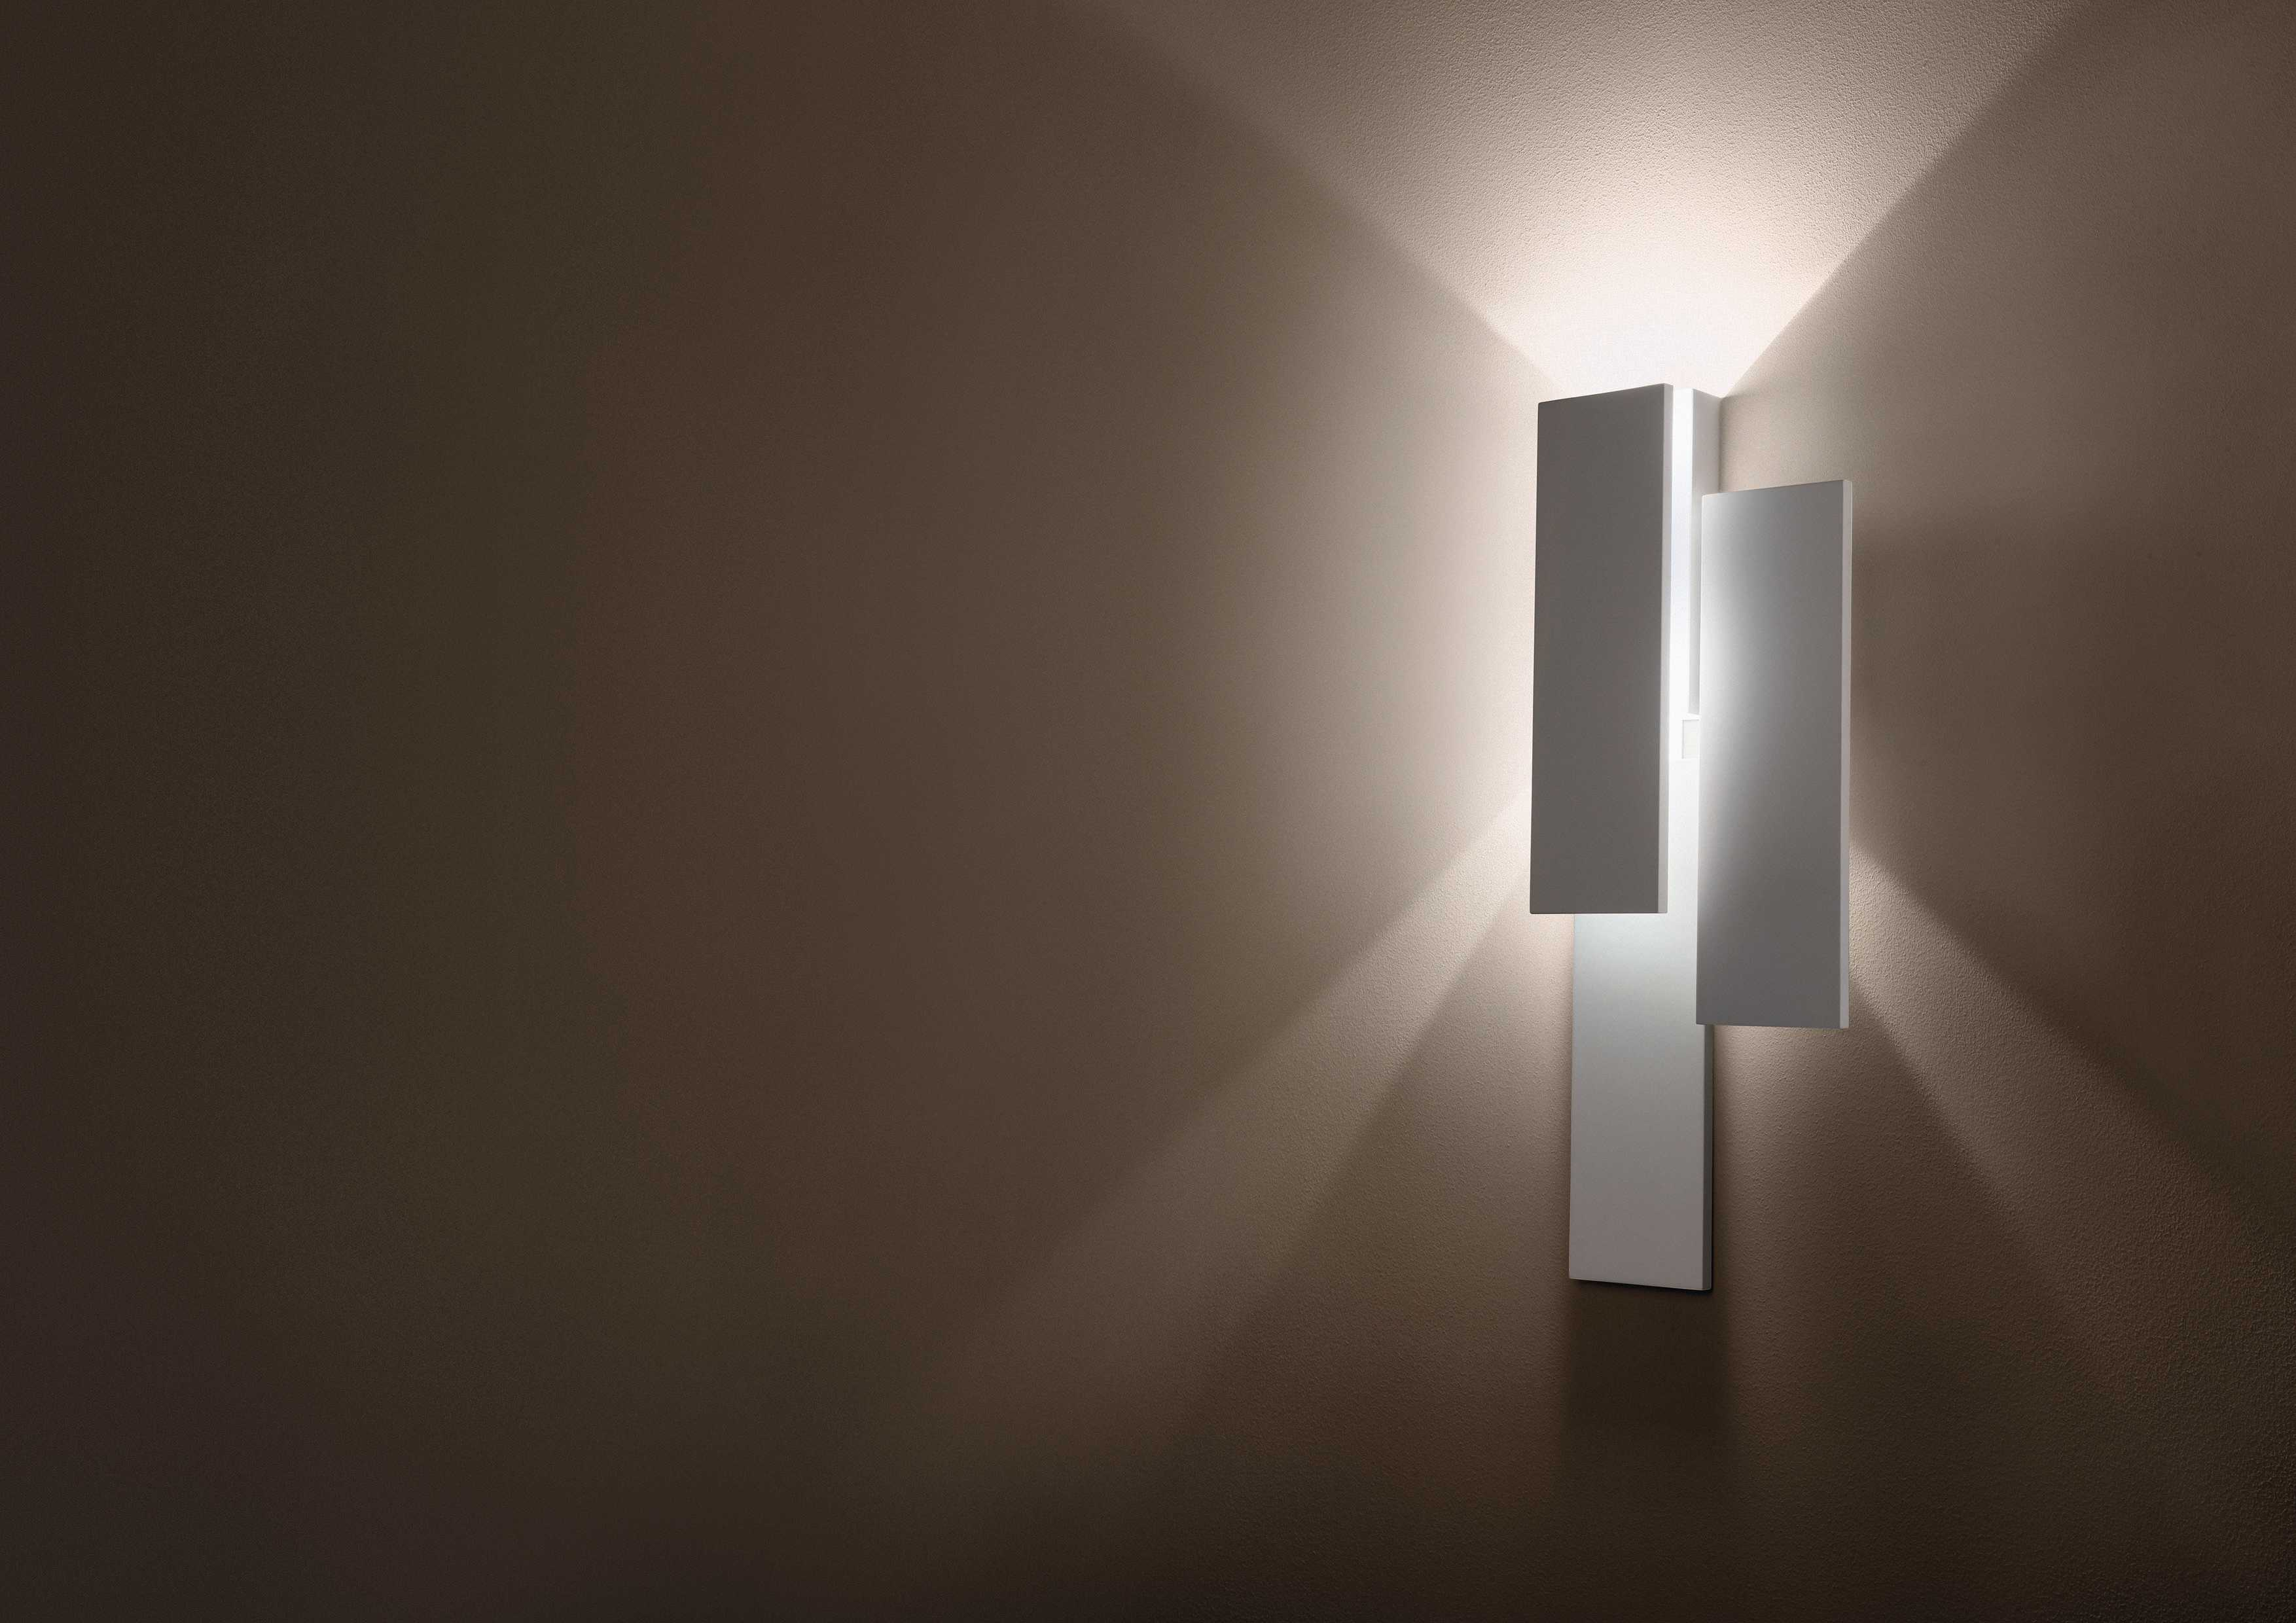 Klang suono lampada da parete led di cini nils led for Lampade a led vendita online